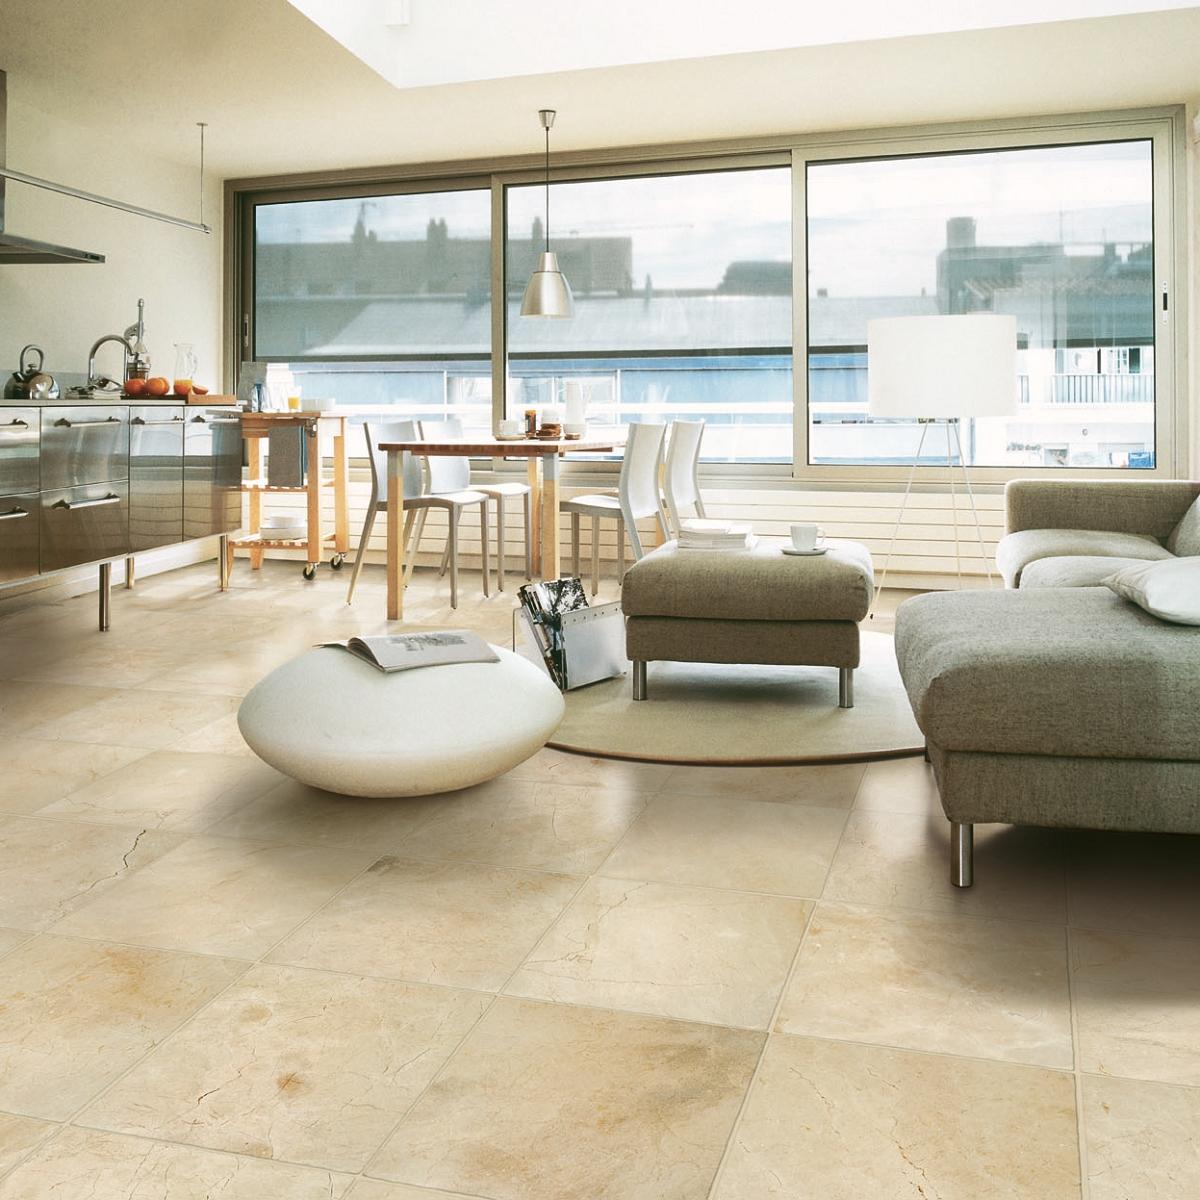 Lot #108: Pallet: Crema Marfil Marble Tile 24